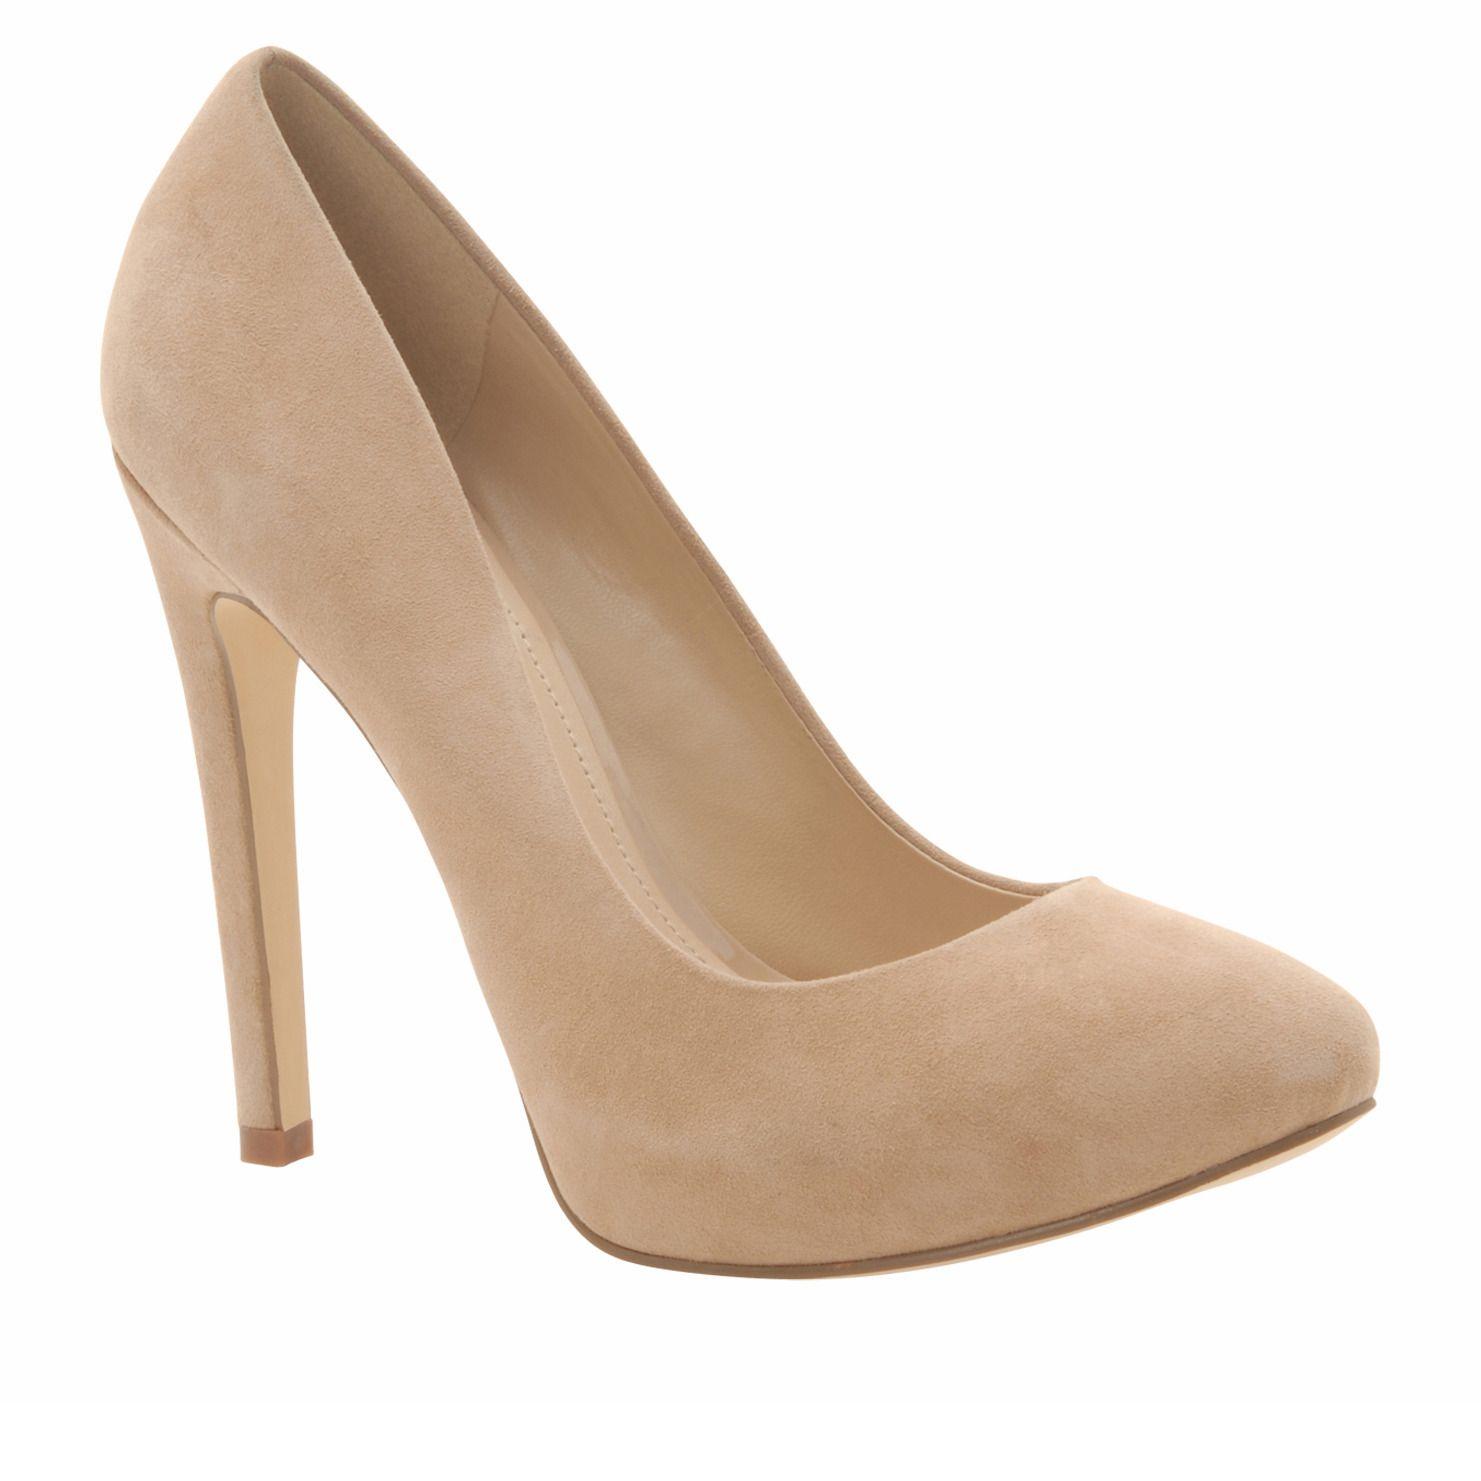 44326154de7 LOVE TROIANO - women s high heels shoes for sale at ALDO Shoes.